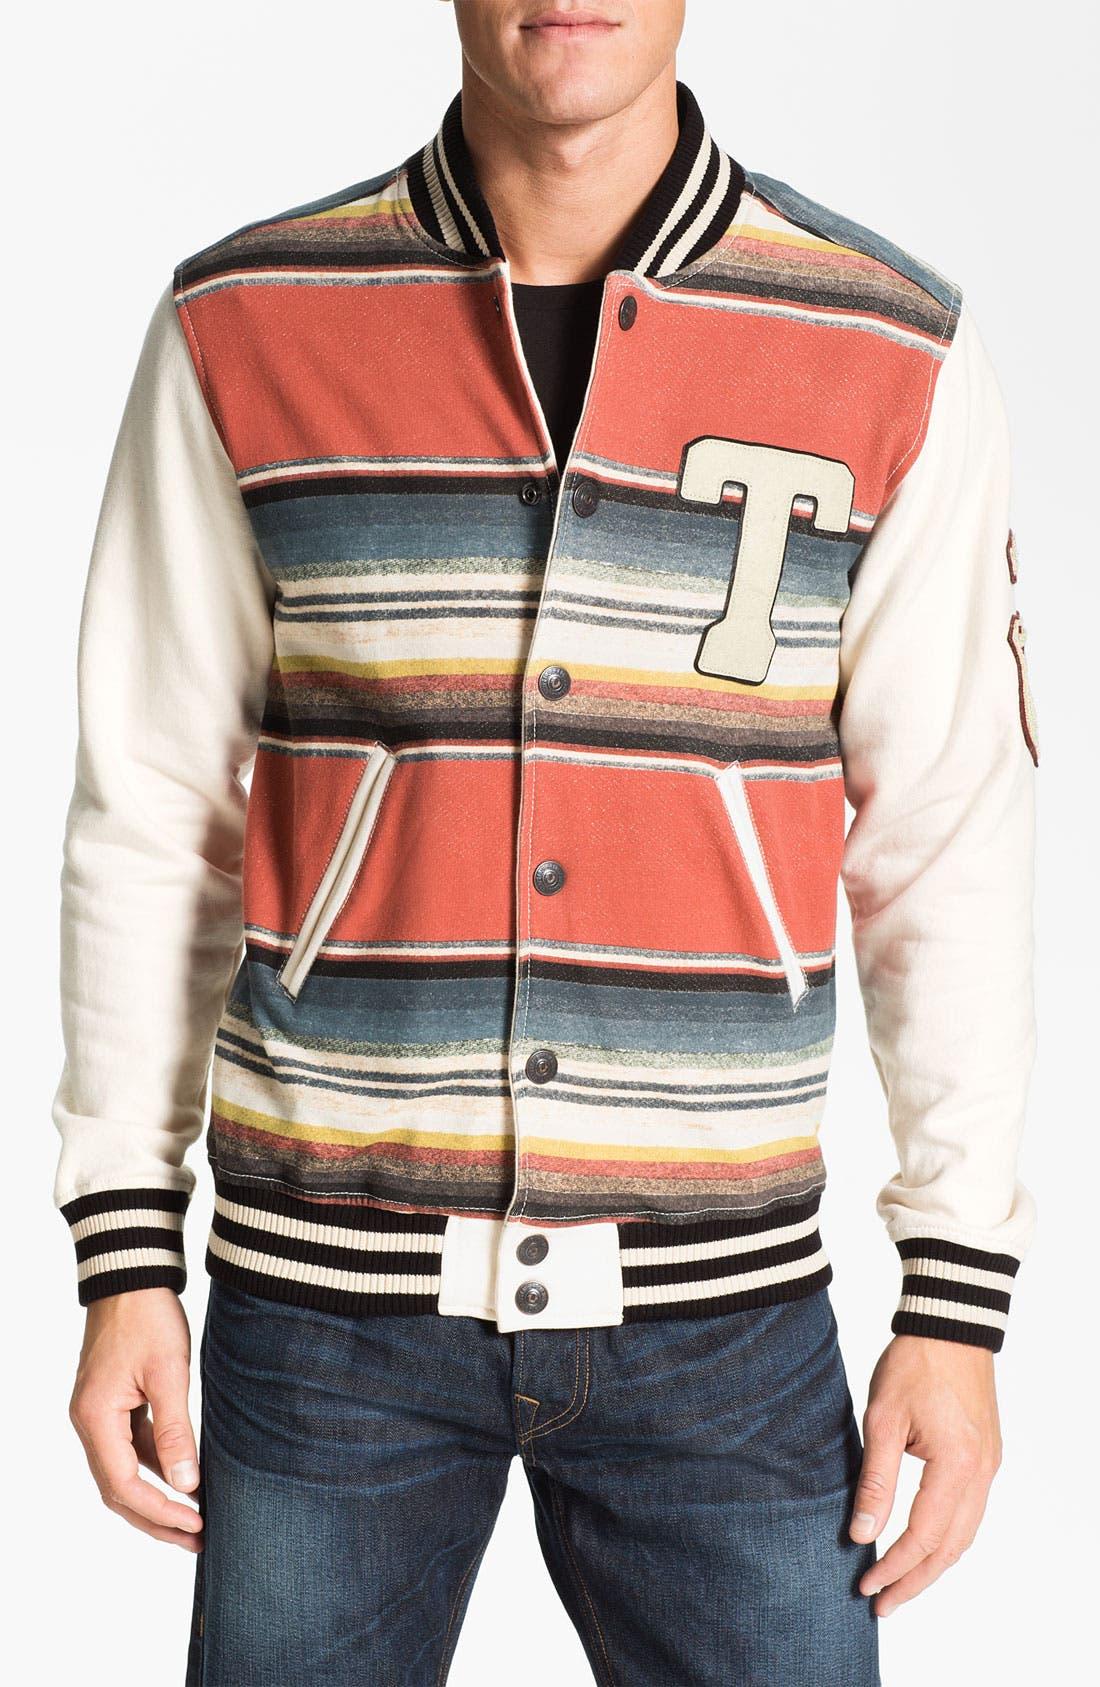 Alternate Image 1 Selected - True Religion Brand Jeans Stripe Print Varsity Jacket